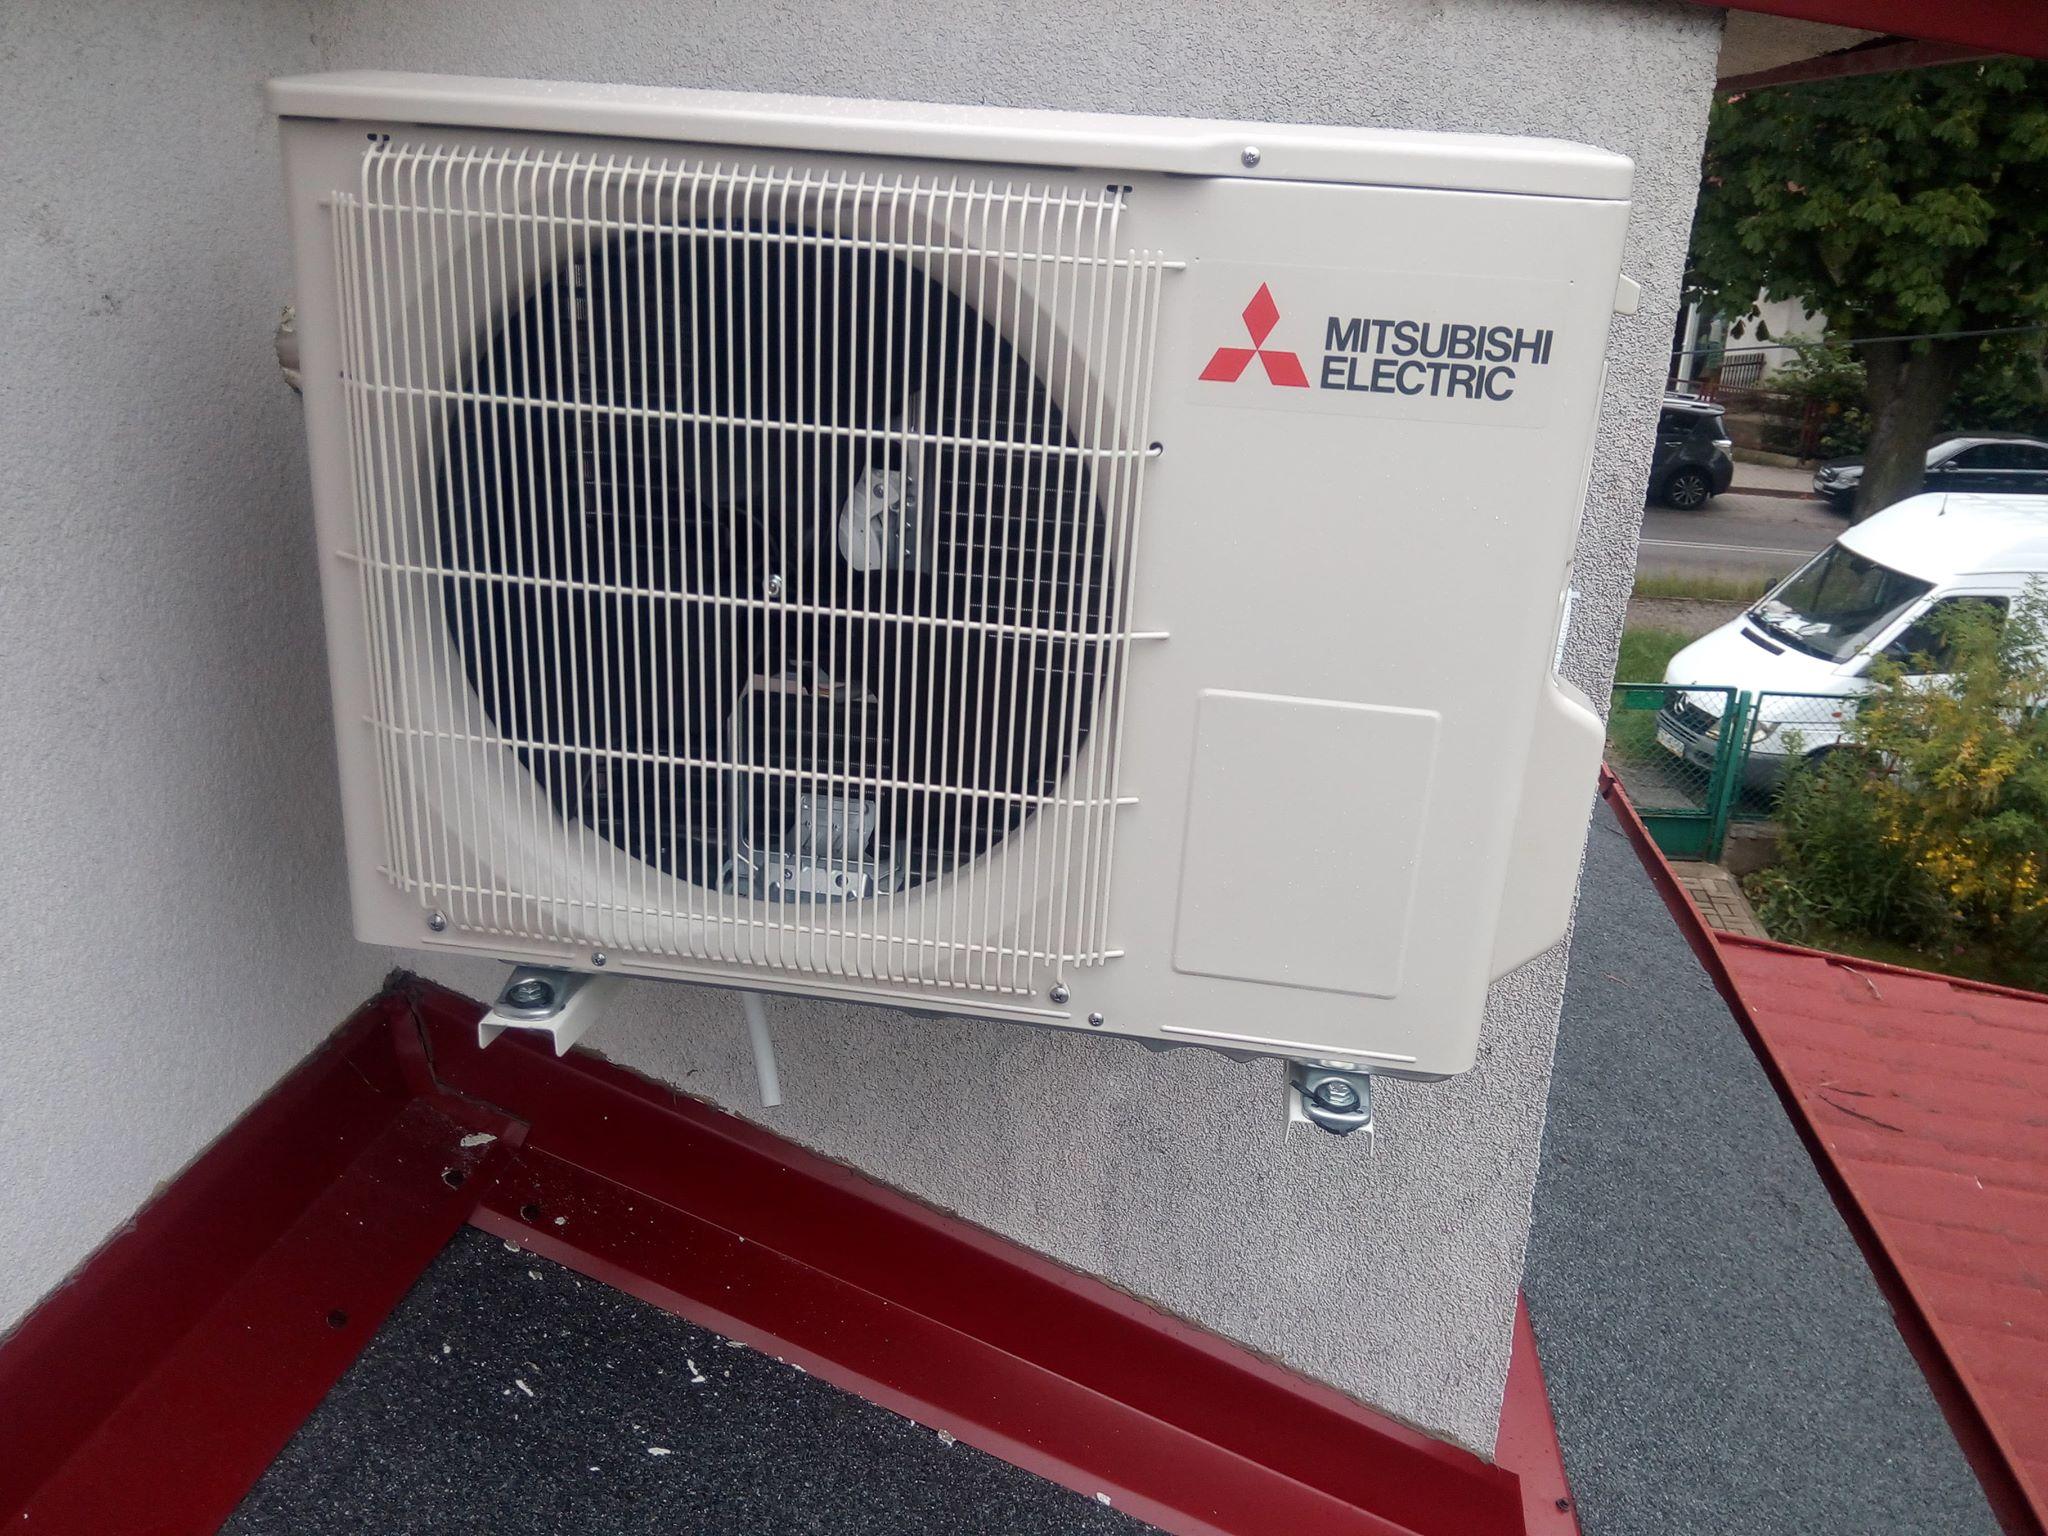 klimatyzacja Mitsubishi Starachowice